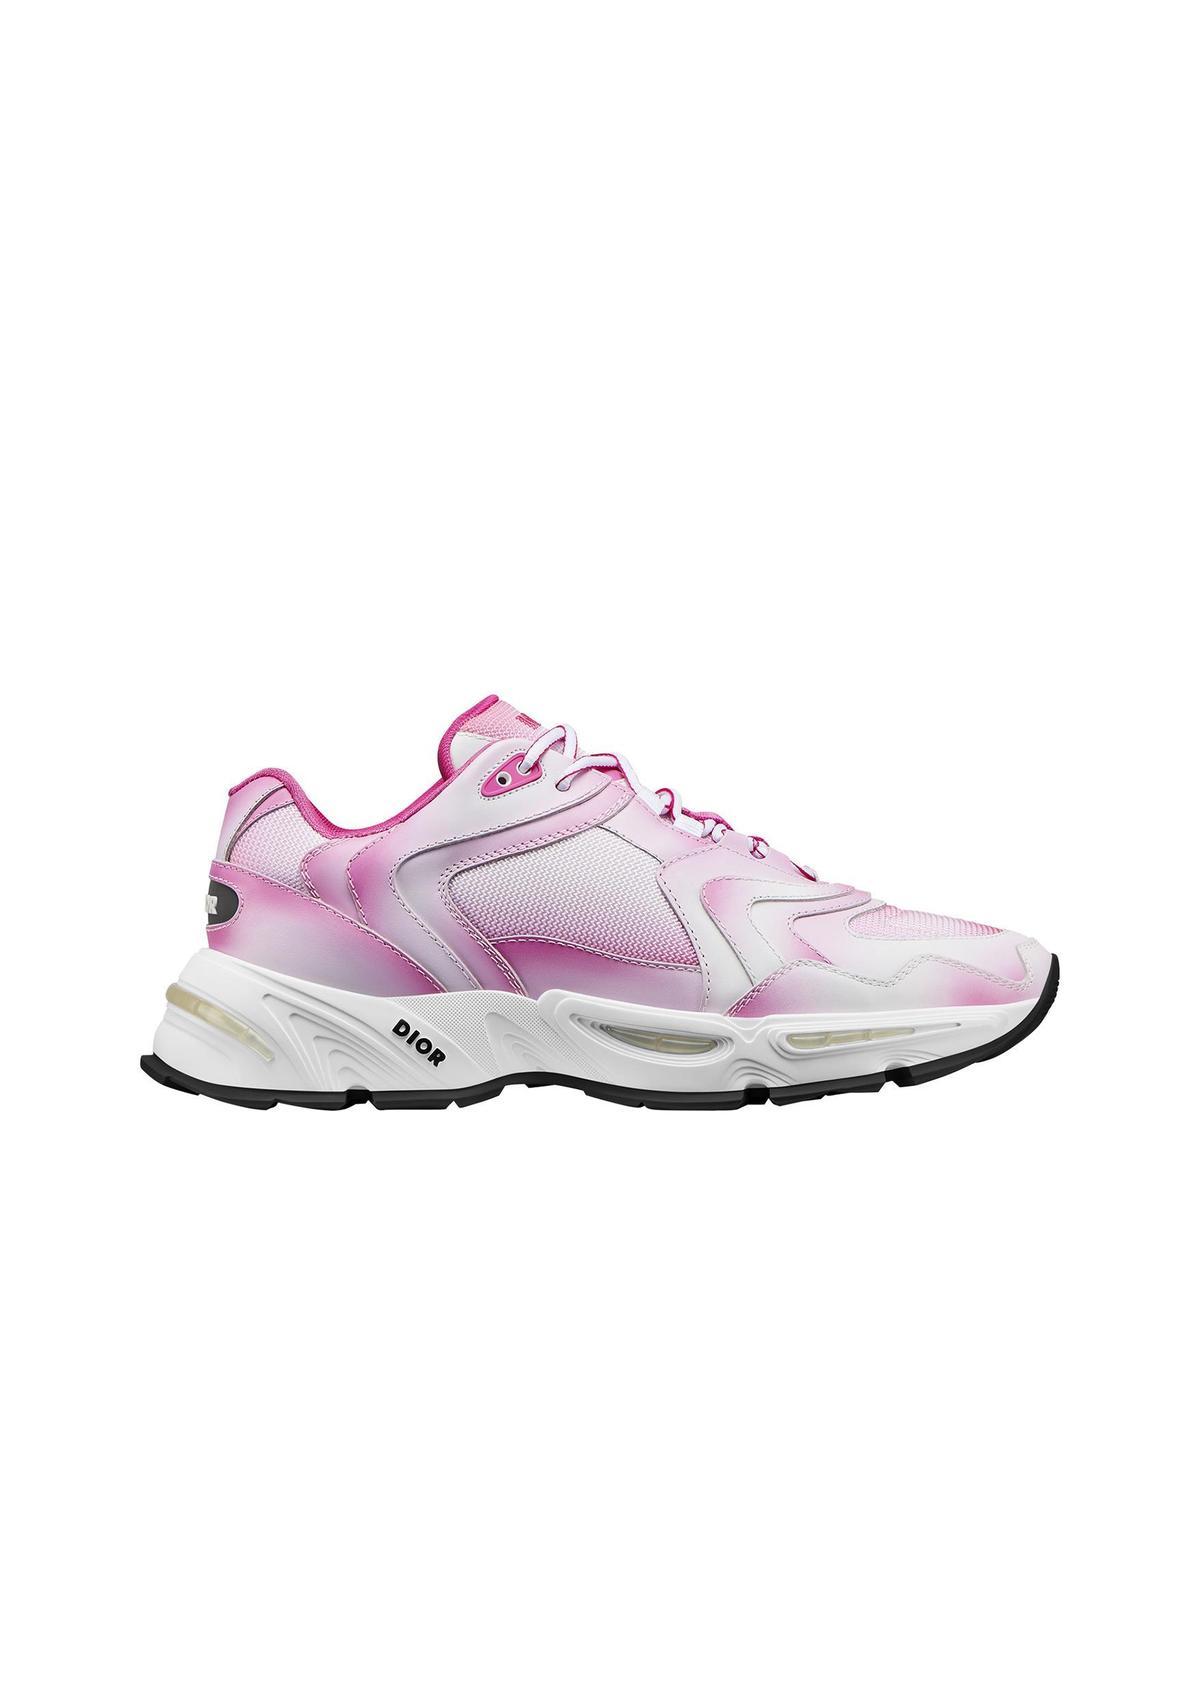 CD1粉色漸層網孔休閒鞋。NT$40,000。(Dior提供)